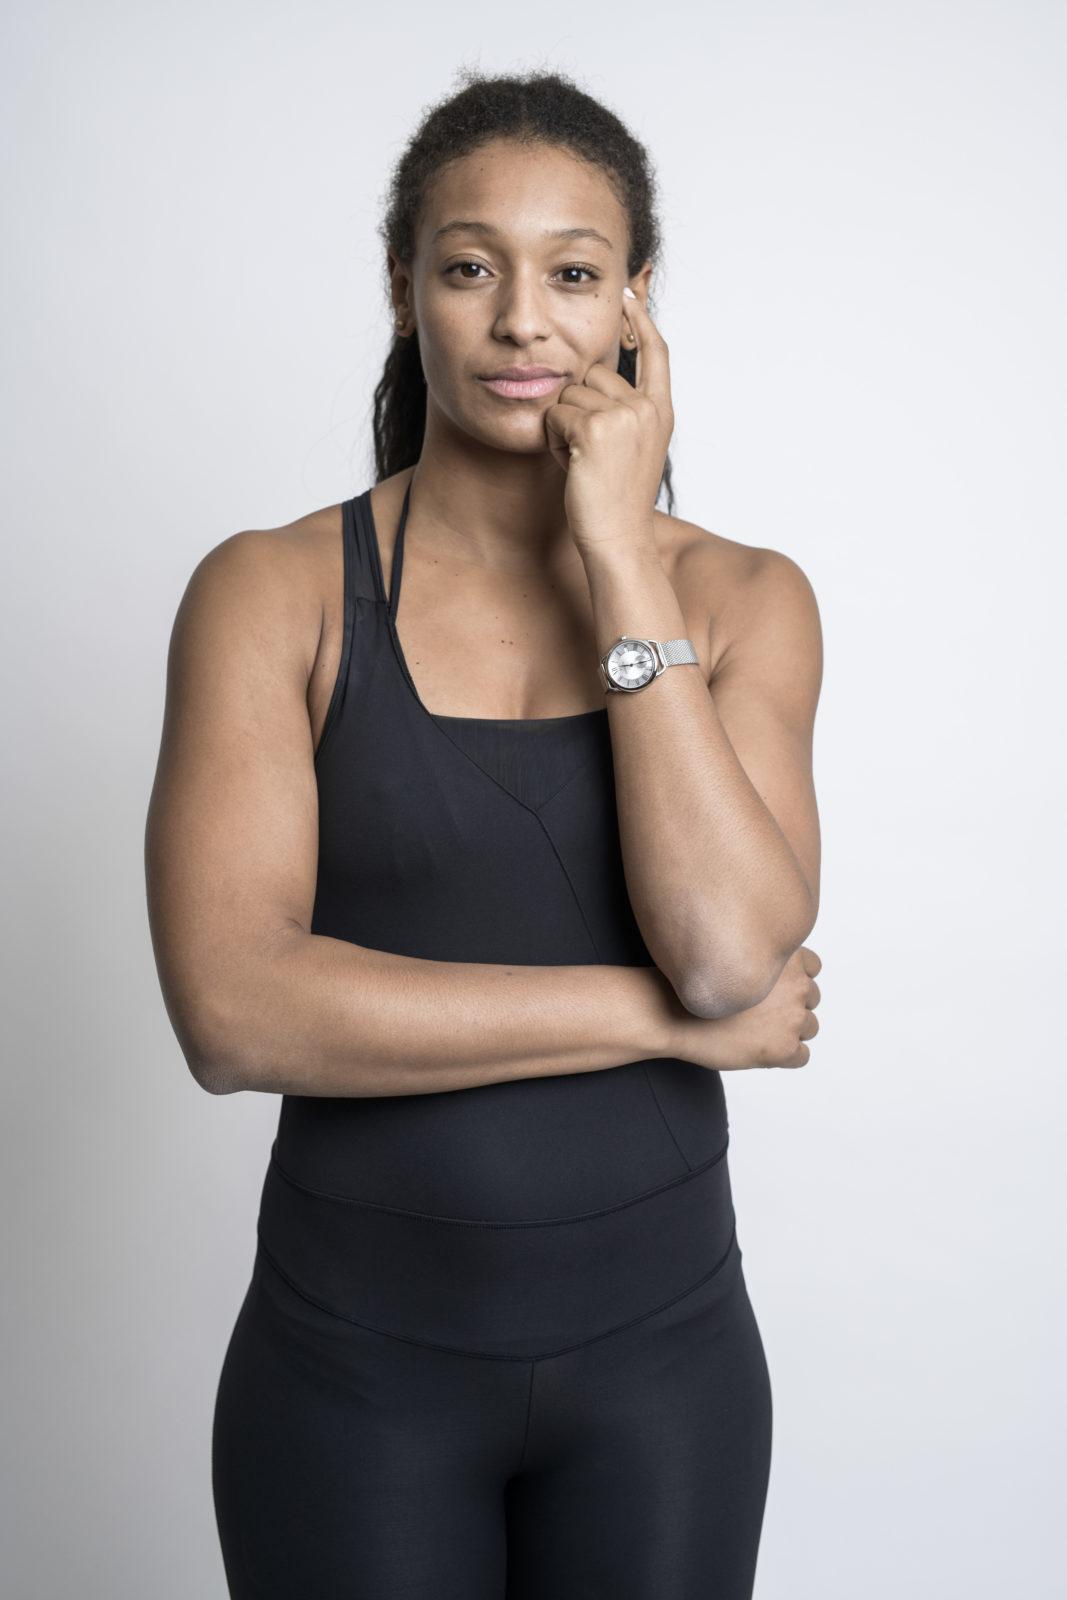 Interview : rencontre avec la  volleyeuse Alexandra Jupiter